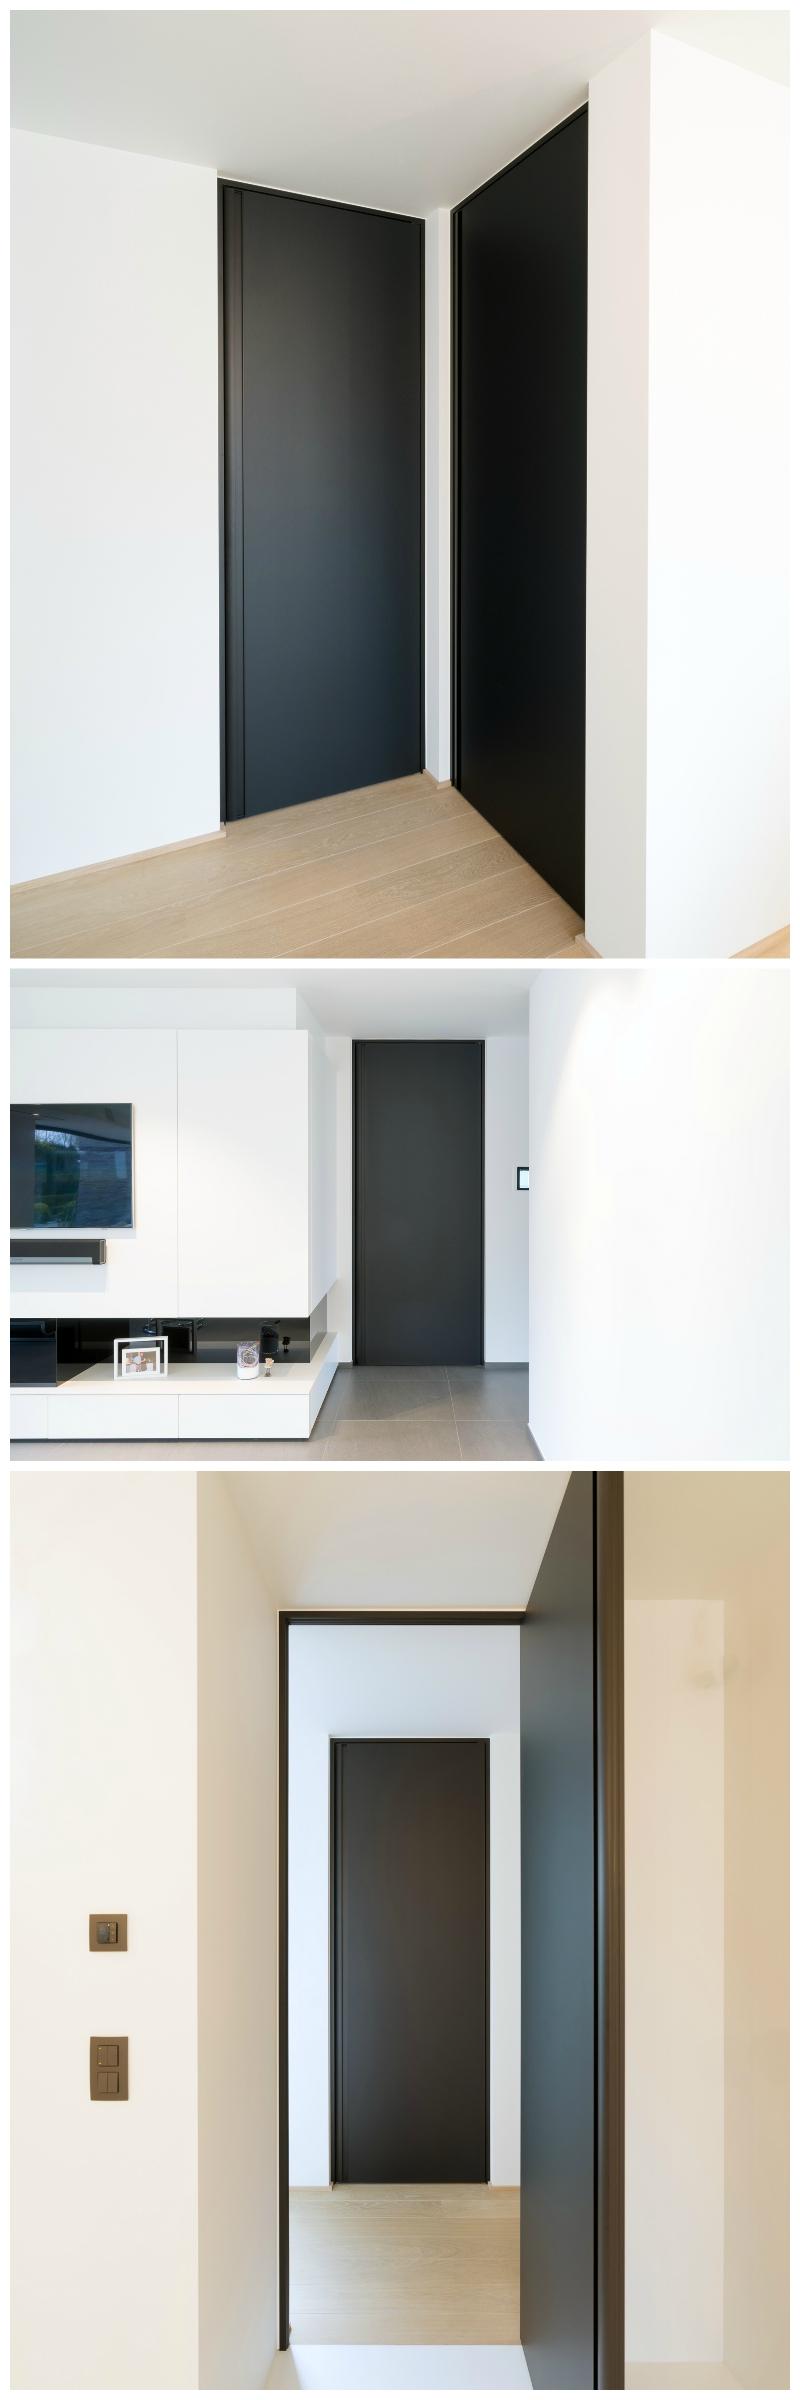 black minimal doors by belgian company anyway doors interieur algemeen pinterest. Black Bedroom Furniture Sets. Home Design Ideas